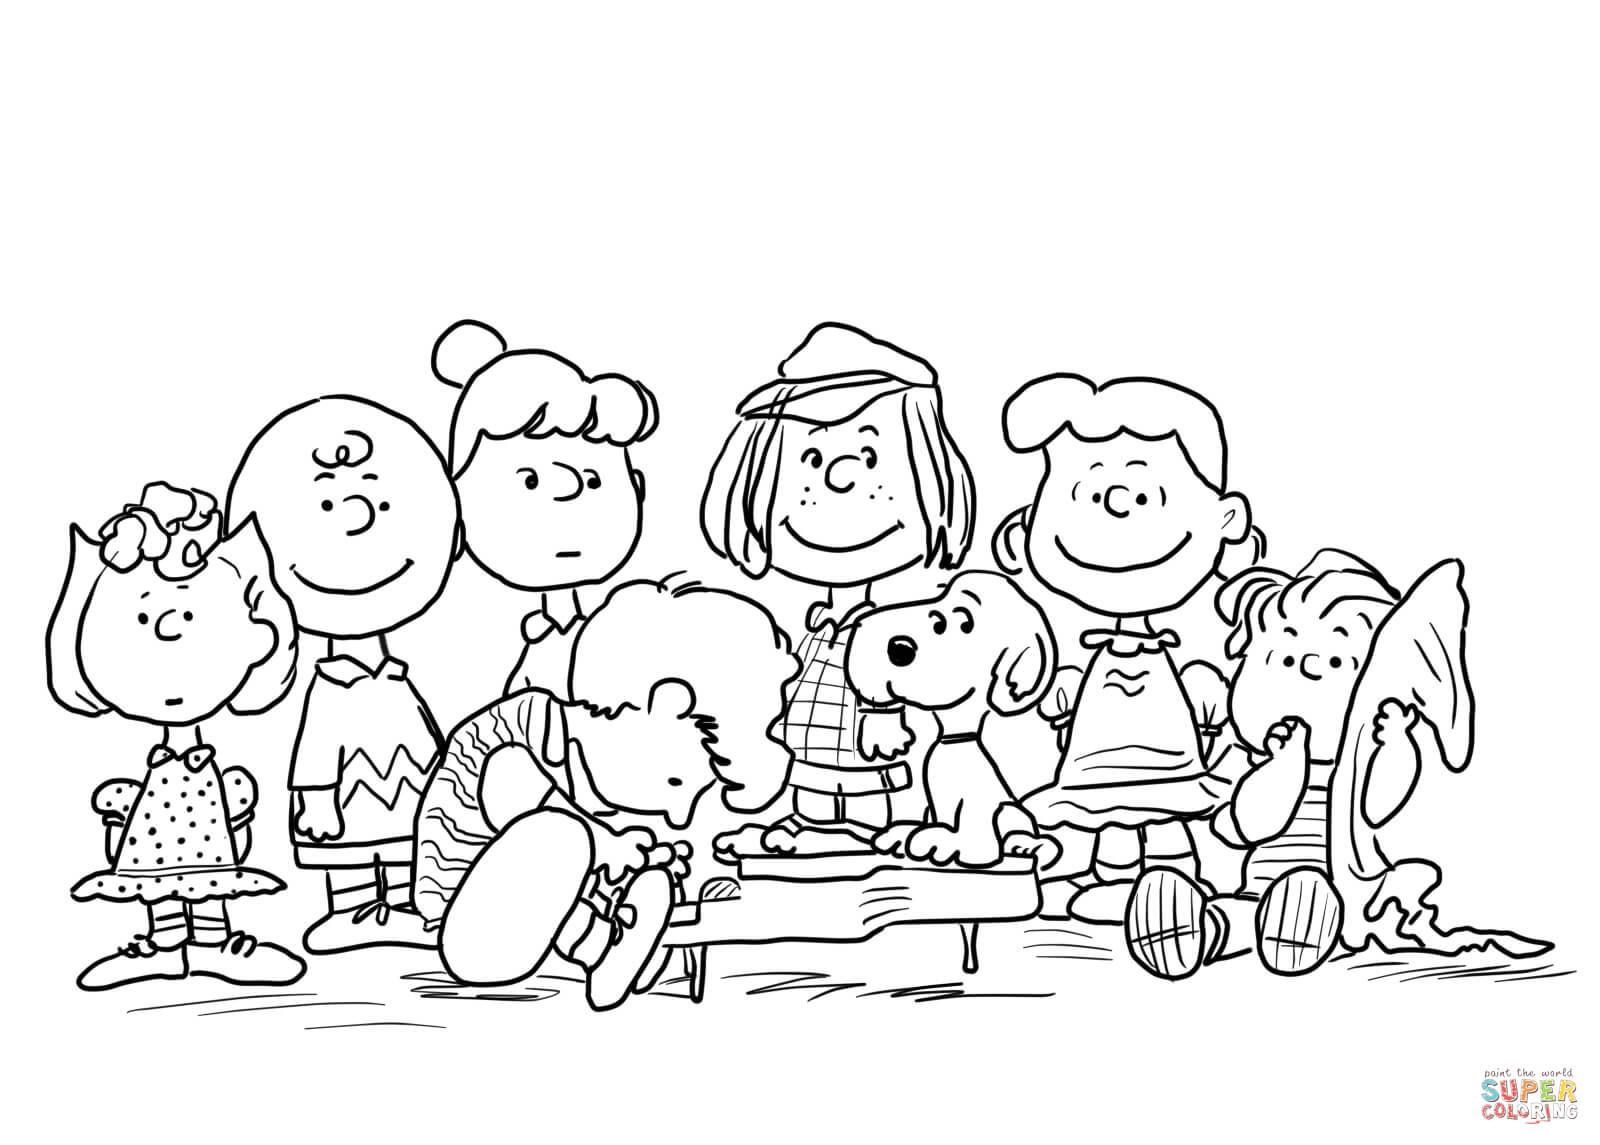 peanut-characters